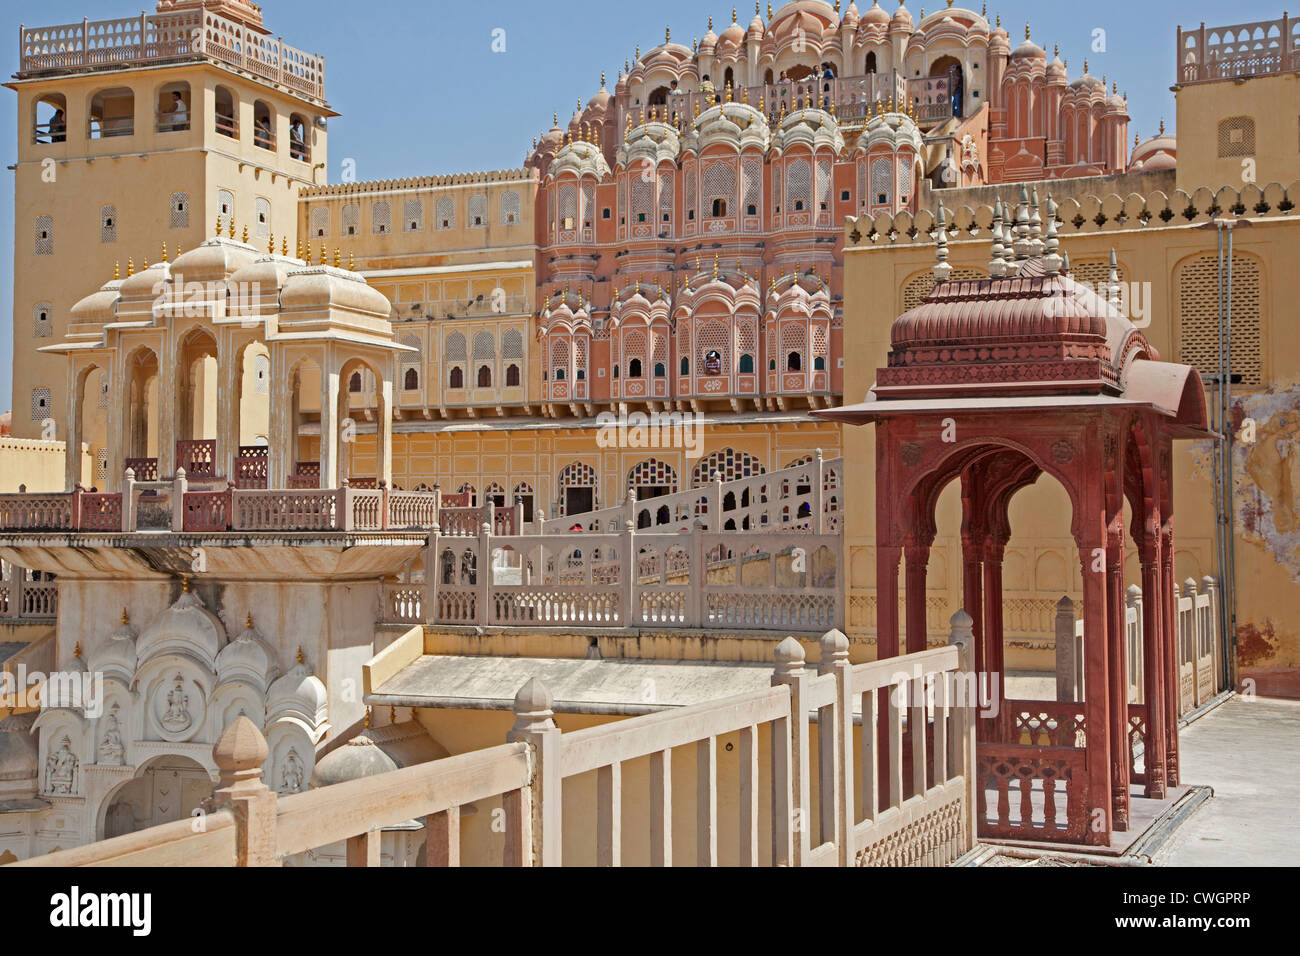 Hawa Mahal / Palace of the Winds in Jaipur, Rajasthan, India - Stock Image